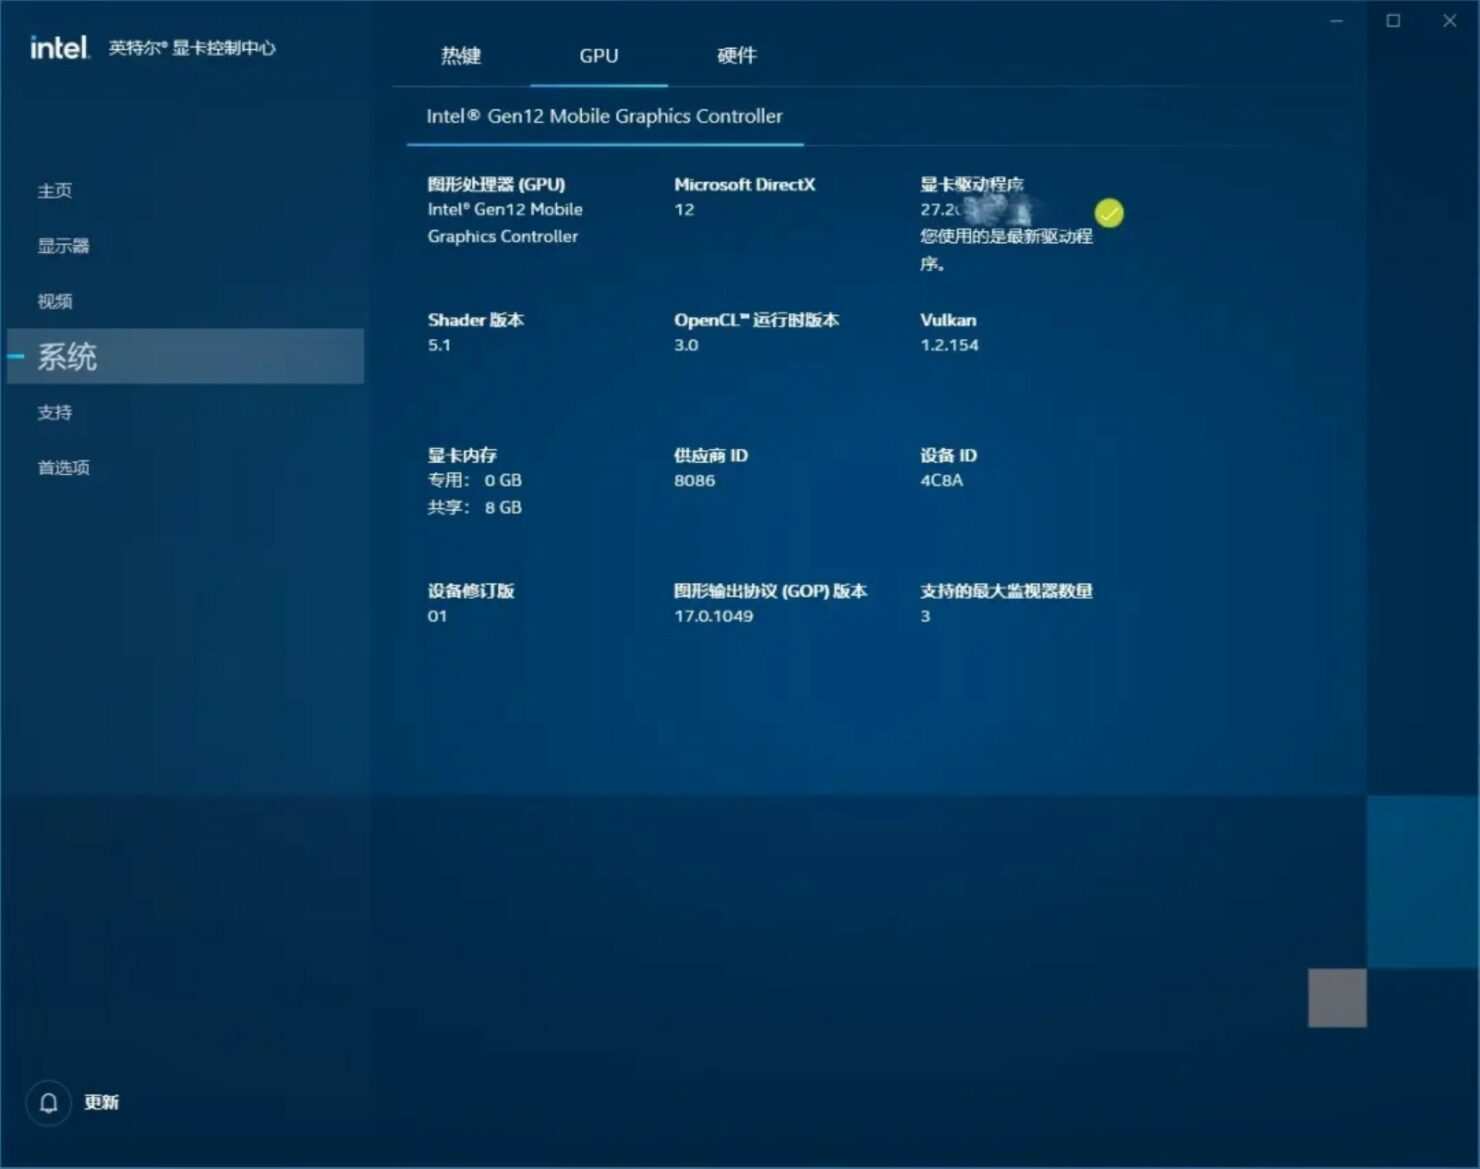 intel-core-i9-11900-8-core-rocket-lake-desktop-cpu-benchmarks-leak-_3-custom